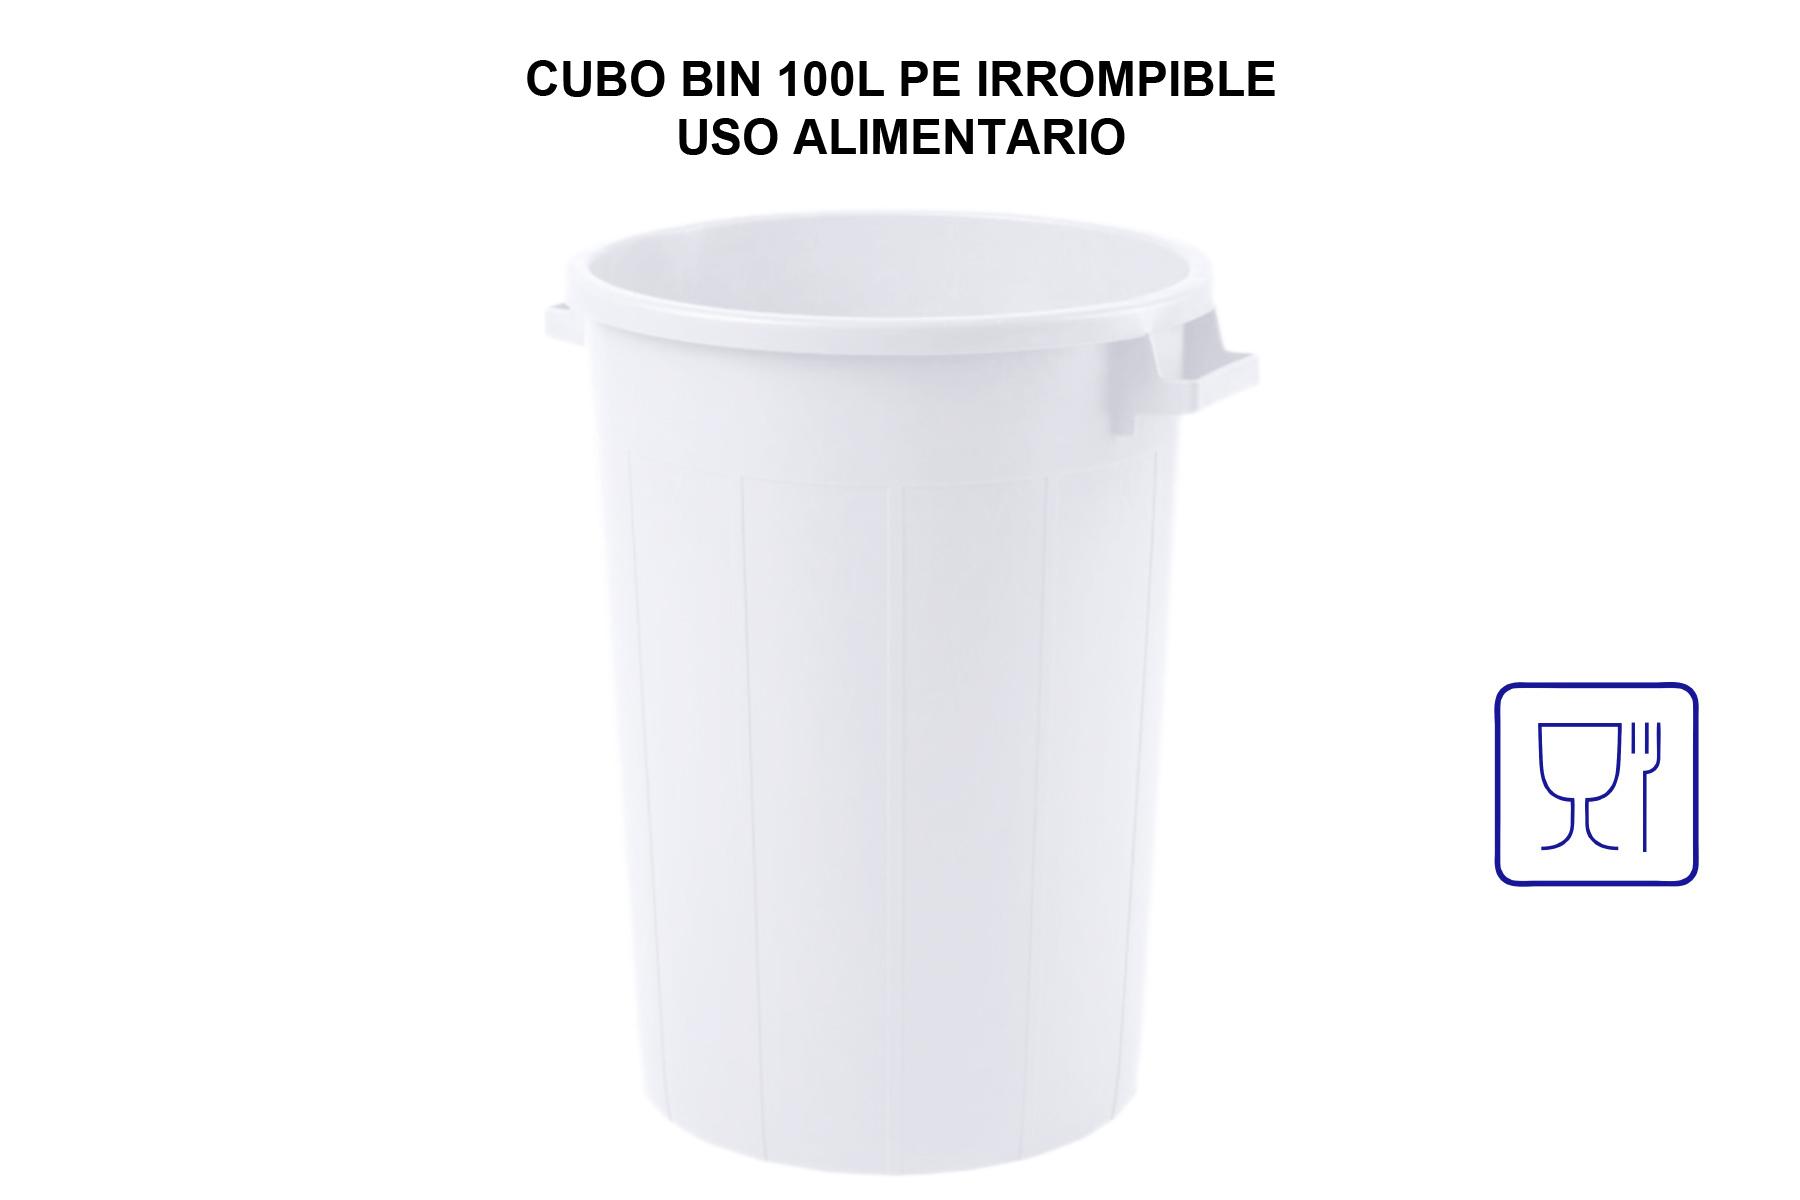 CUBO BIN 100L PE IRROMPIBLE USO ALIMENTARIO